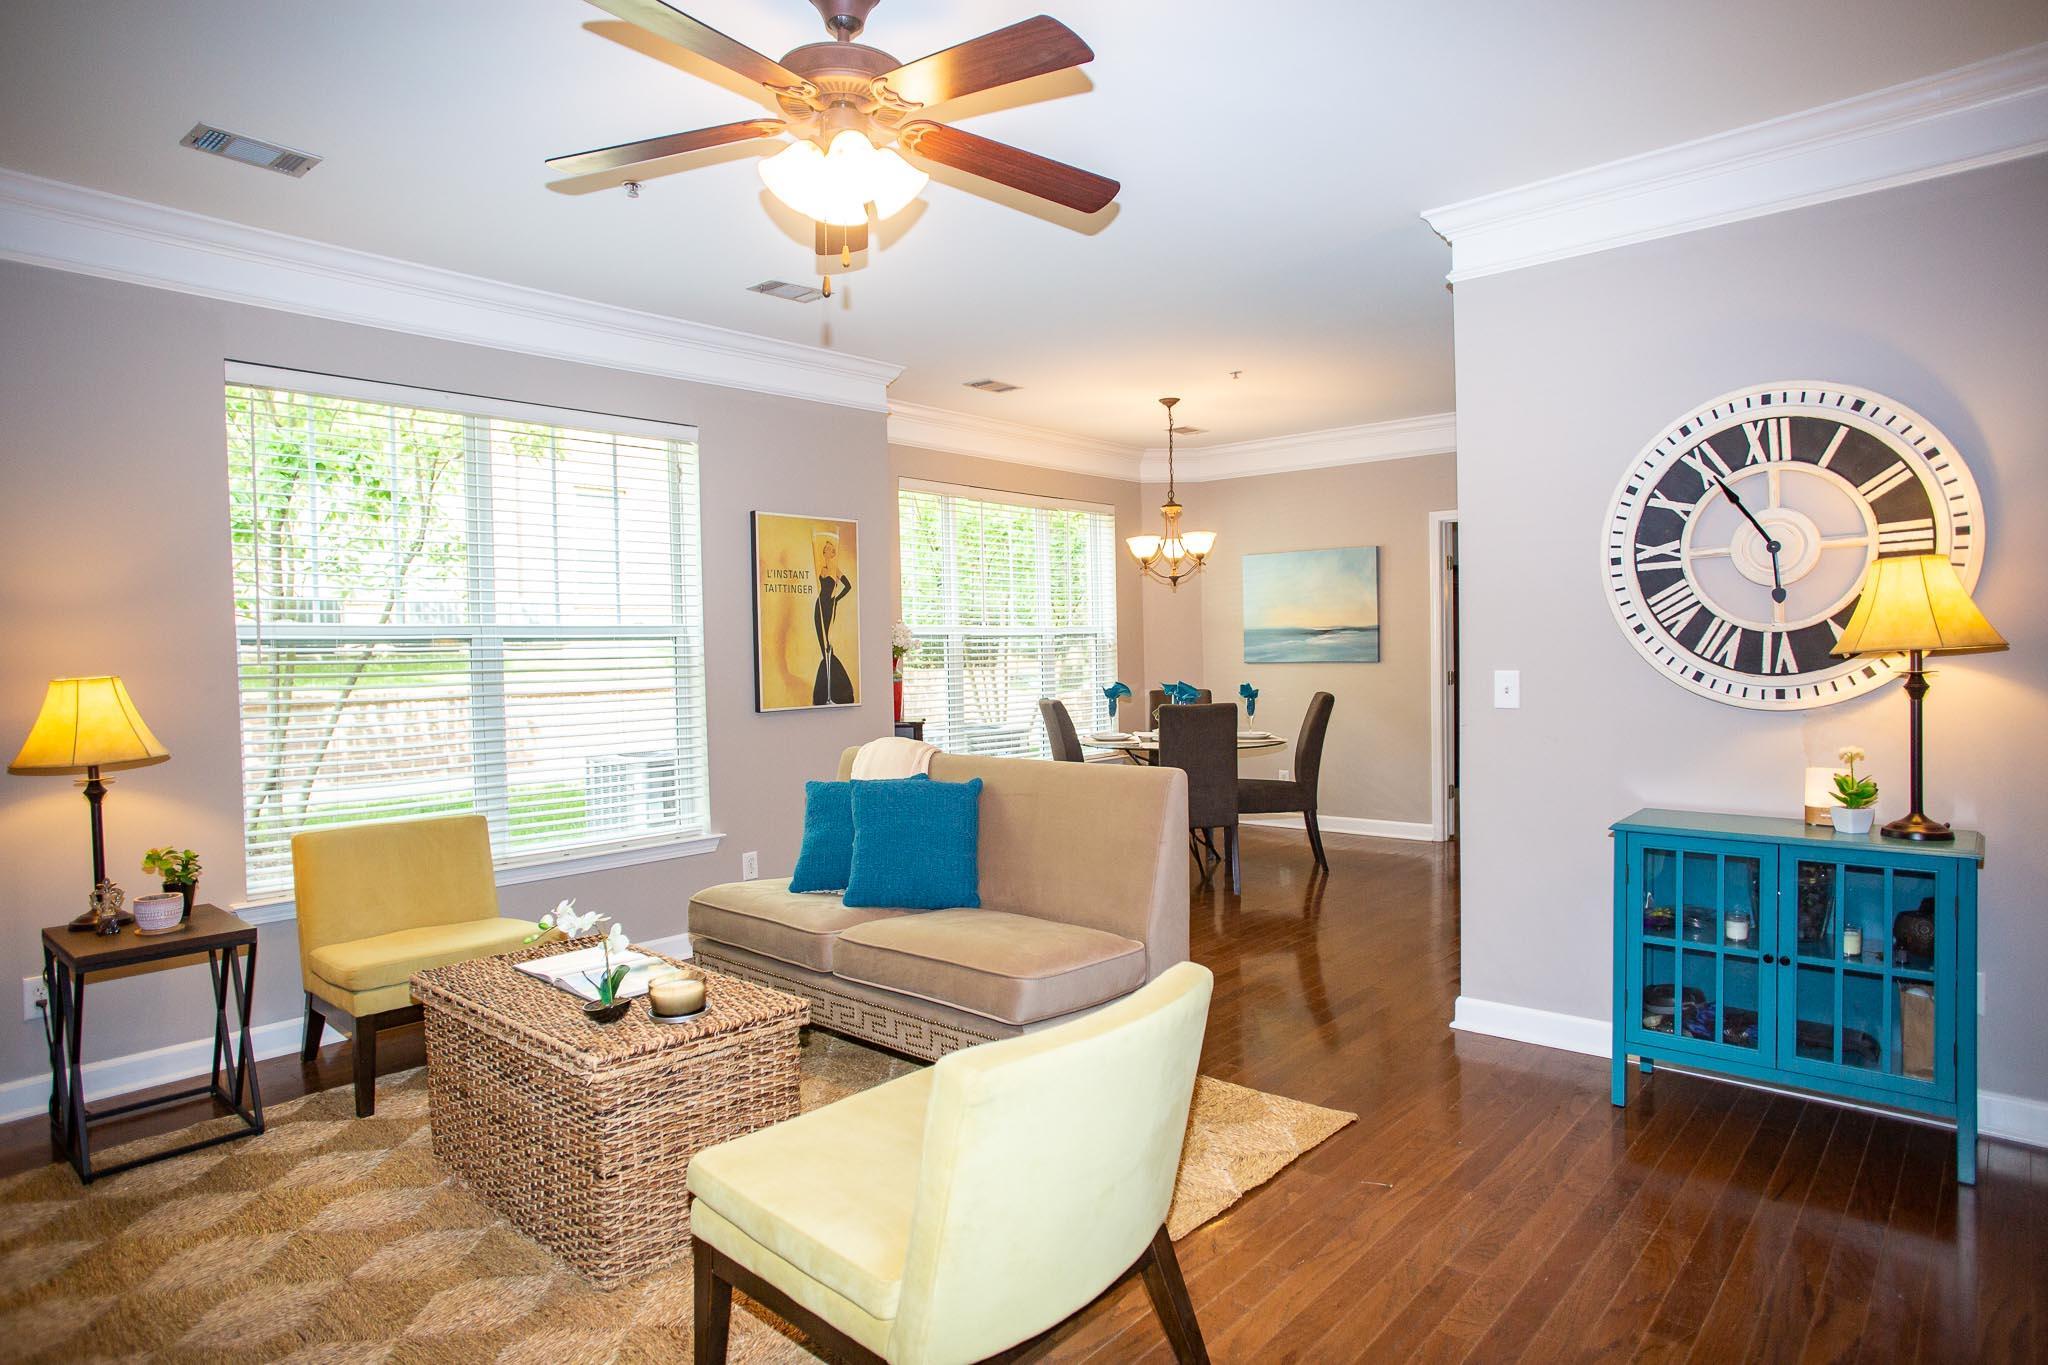 2310 Elliott Ave Apt 701, Nashville-Southeast in Davidson County County, TN 37204 Home for Sale